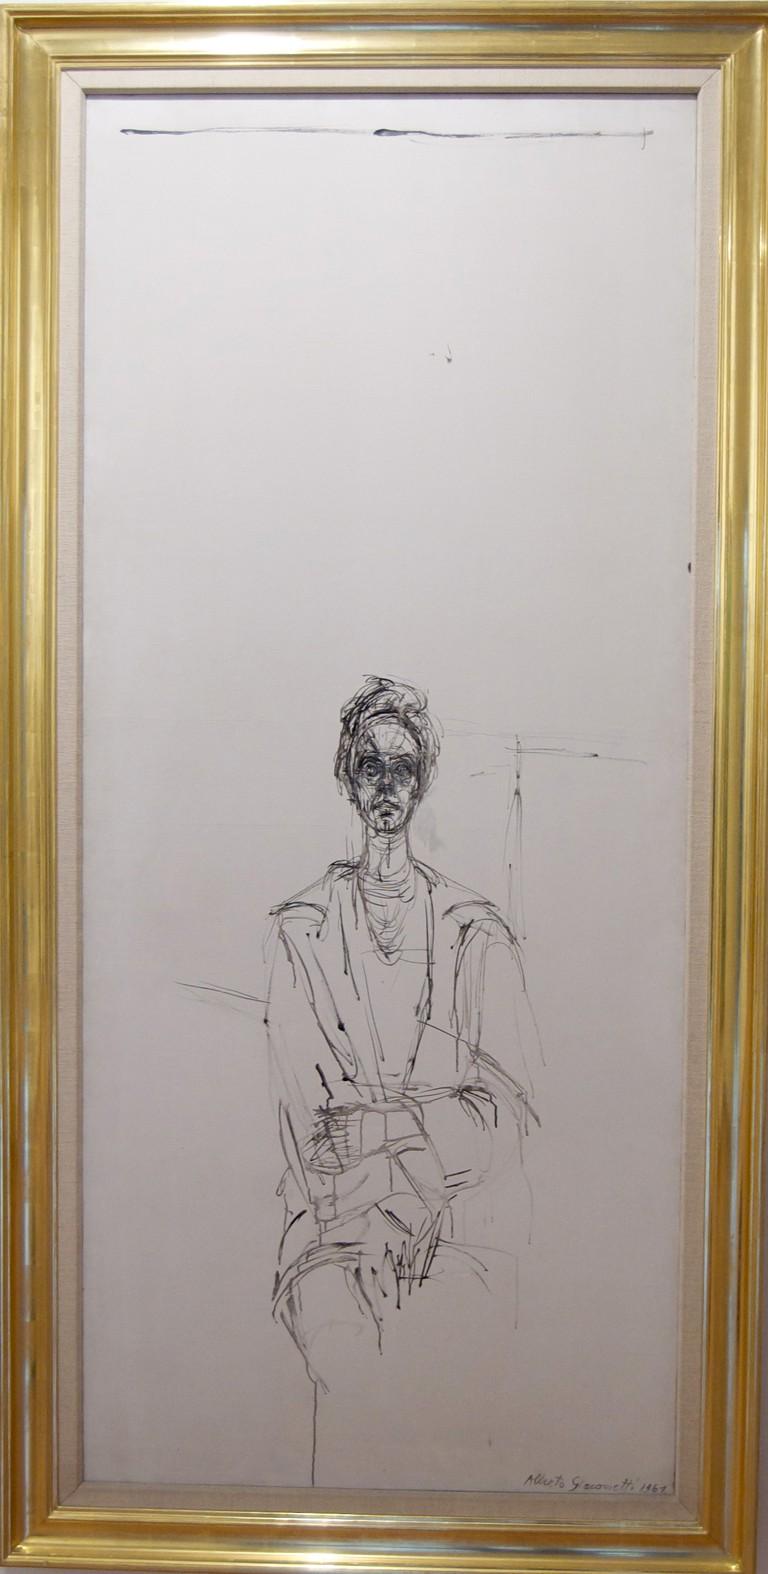 Alberto Giamotti, Carolina Sobre Fondo Blanco, Ink on Canvas, 1961 (photo cropped)